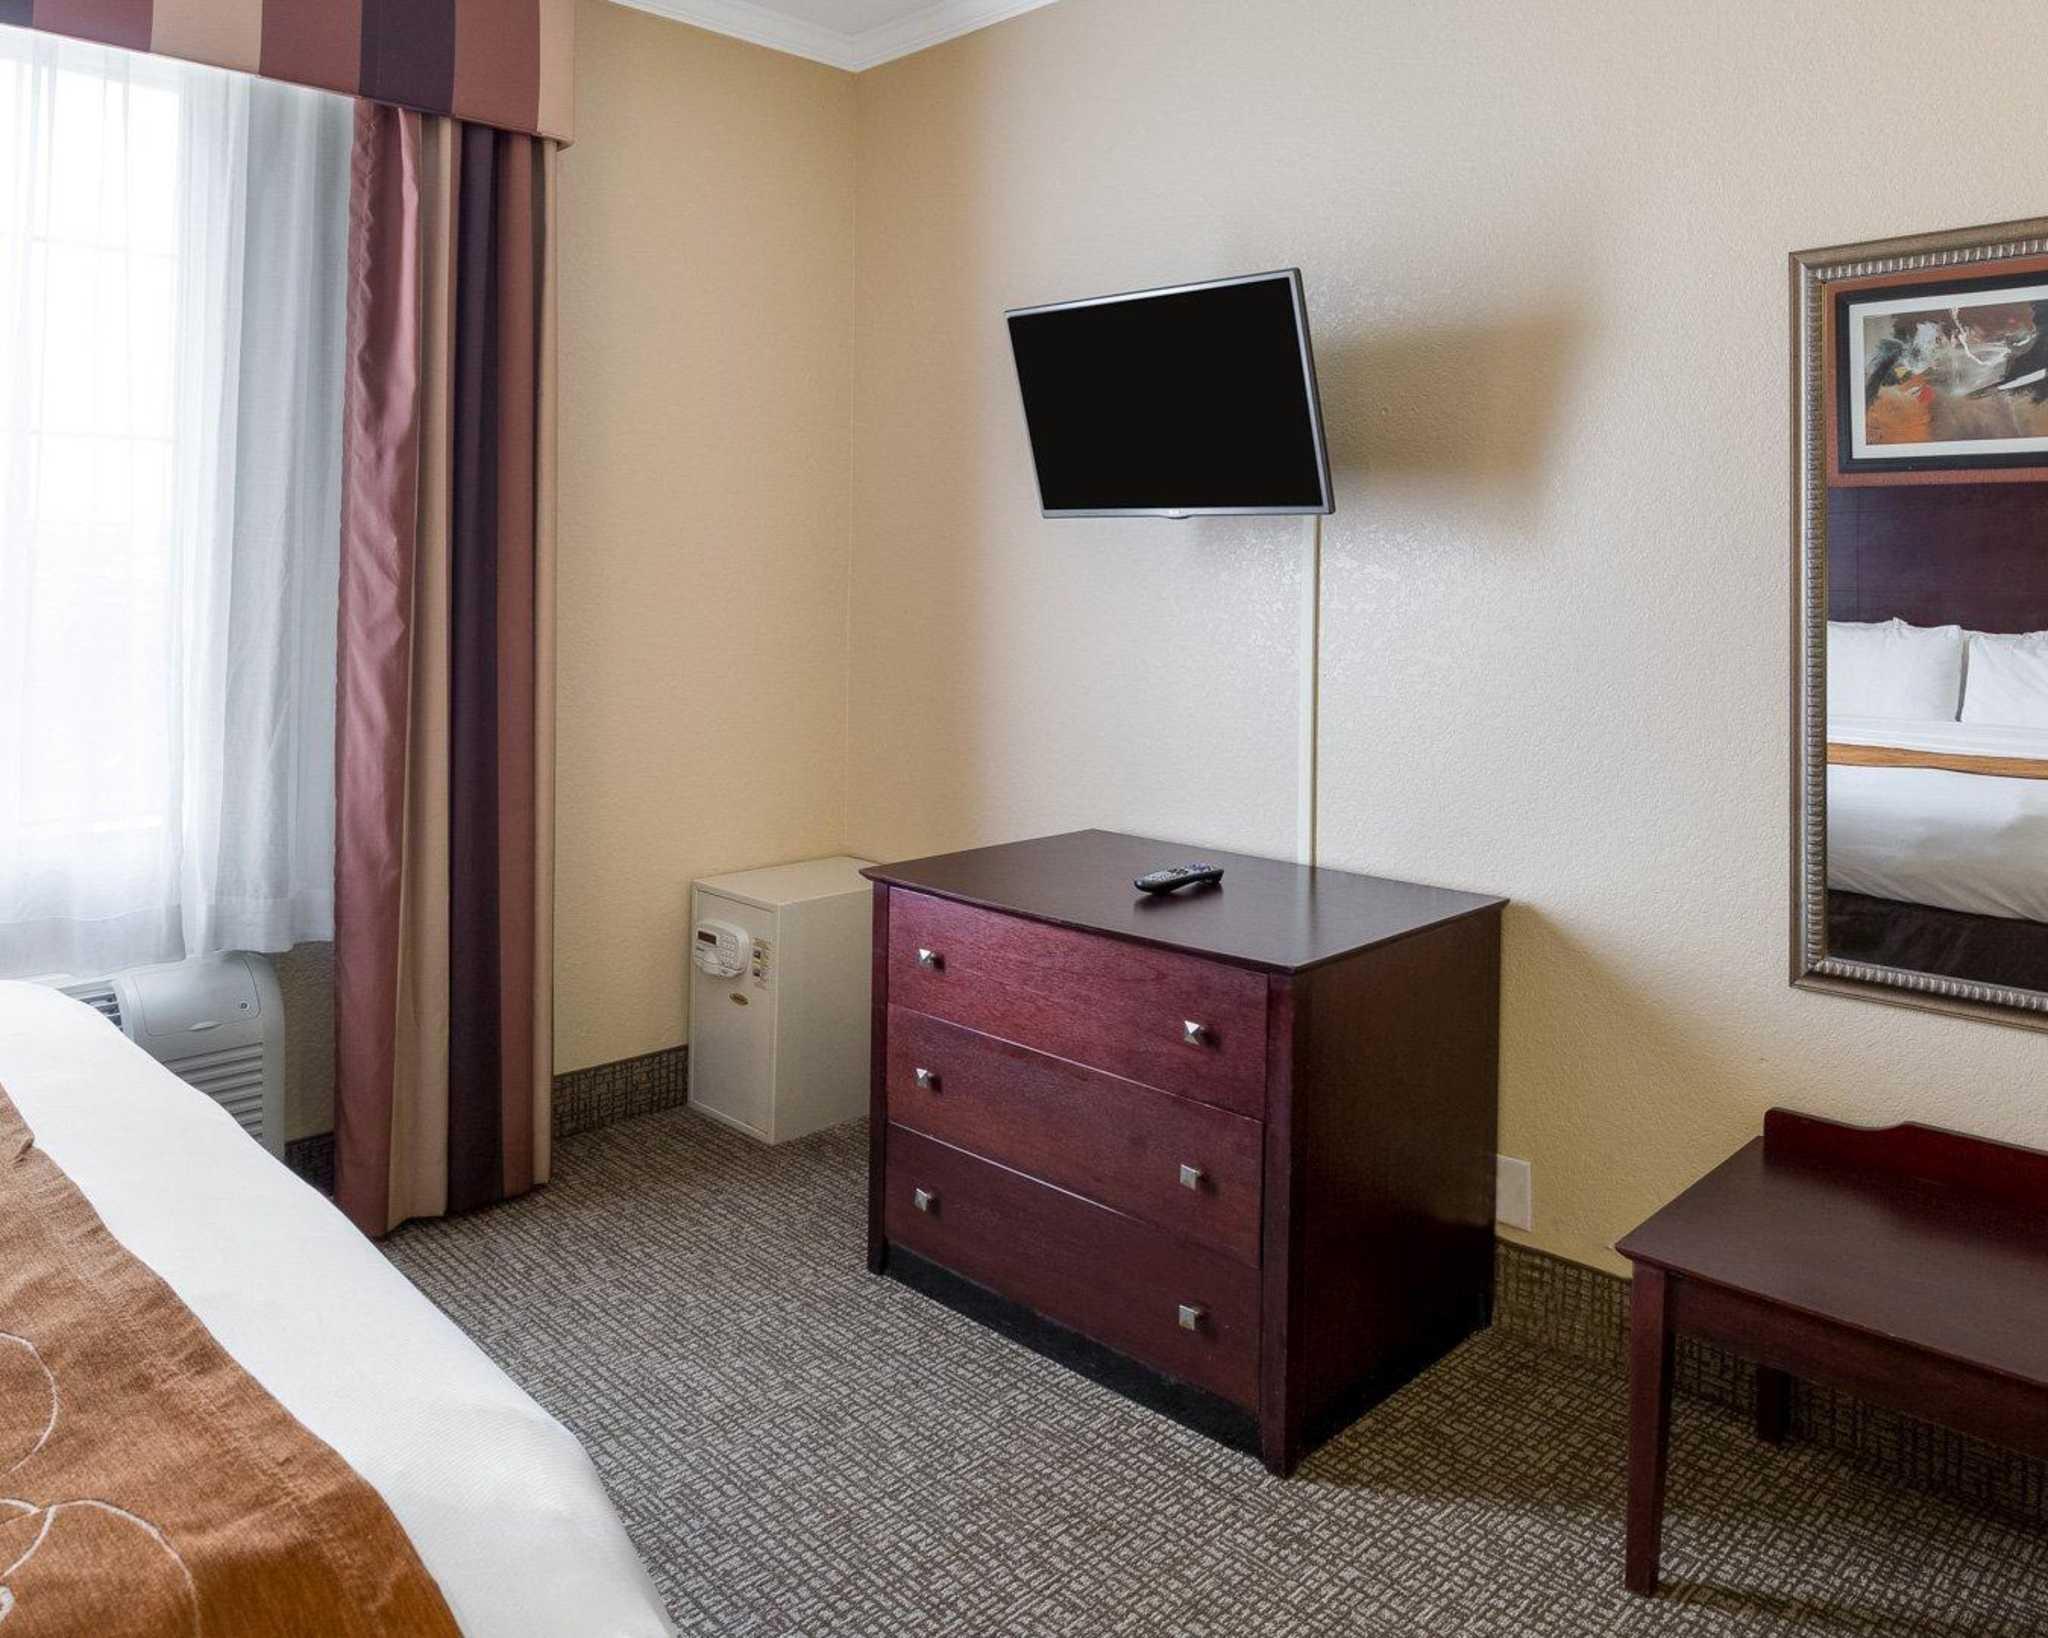 Comfort Suites image 41